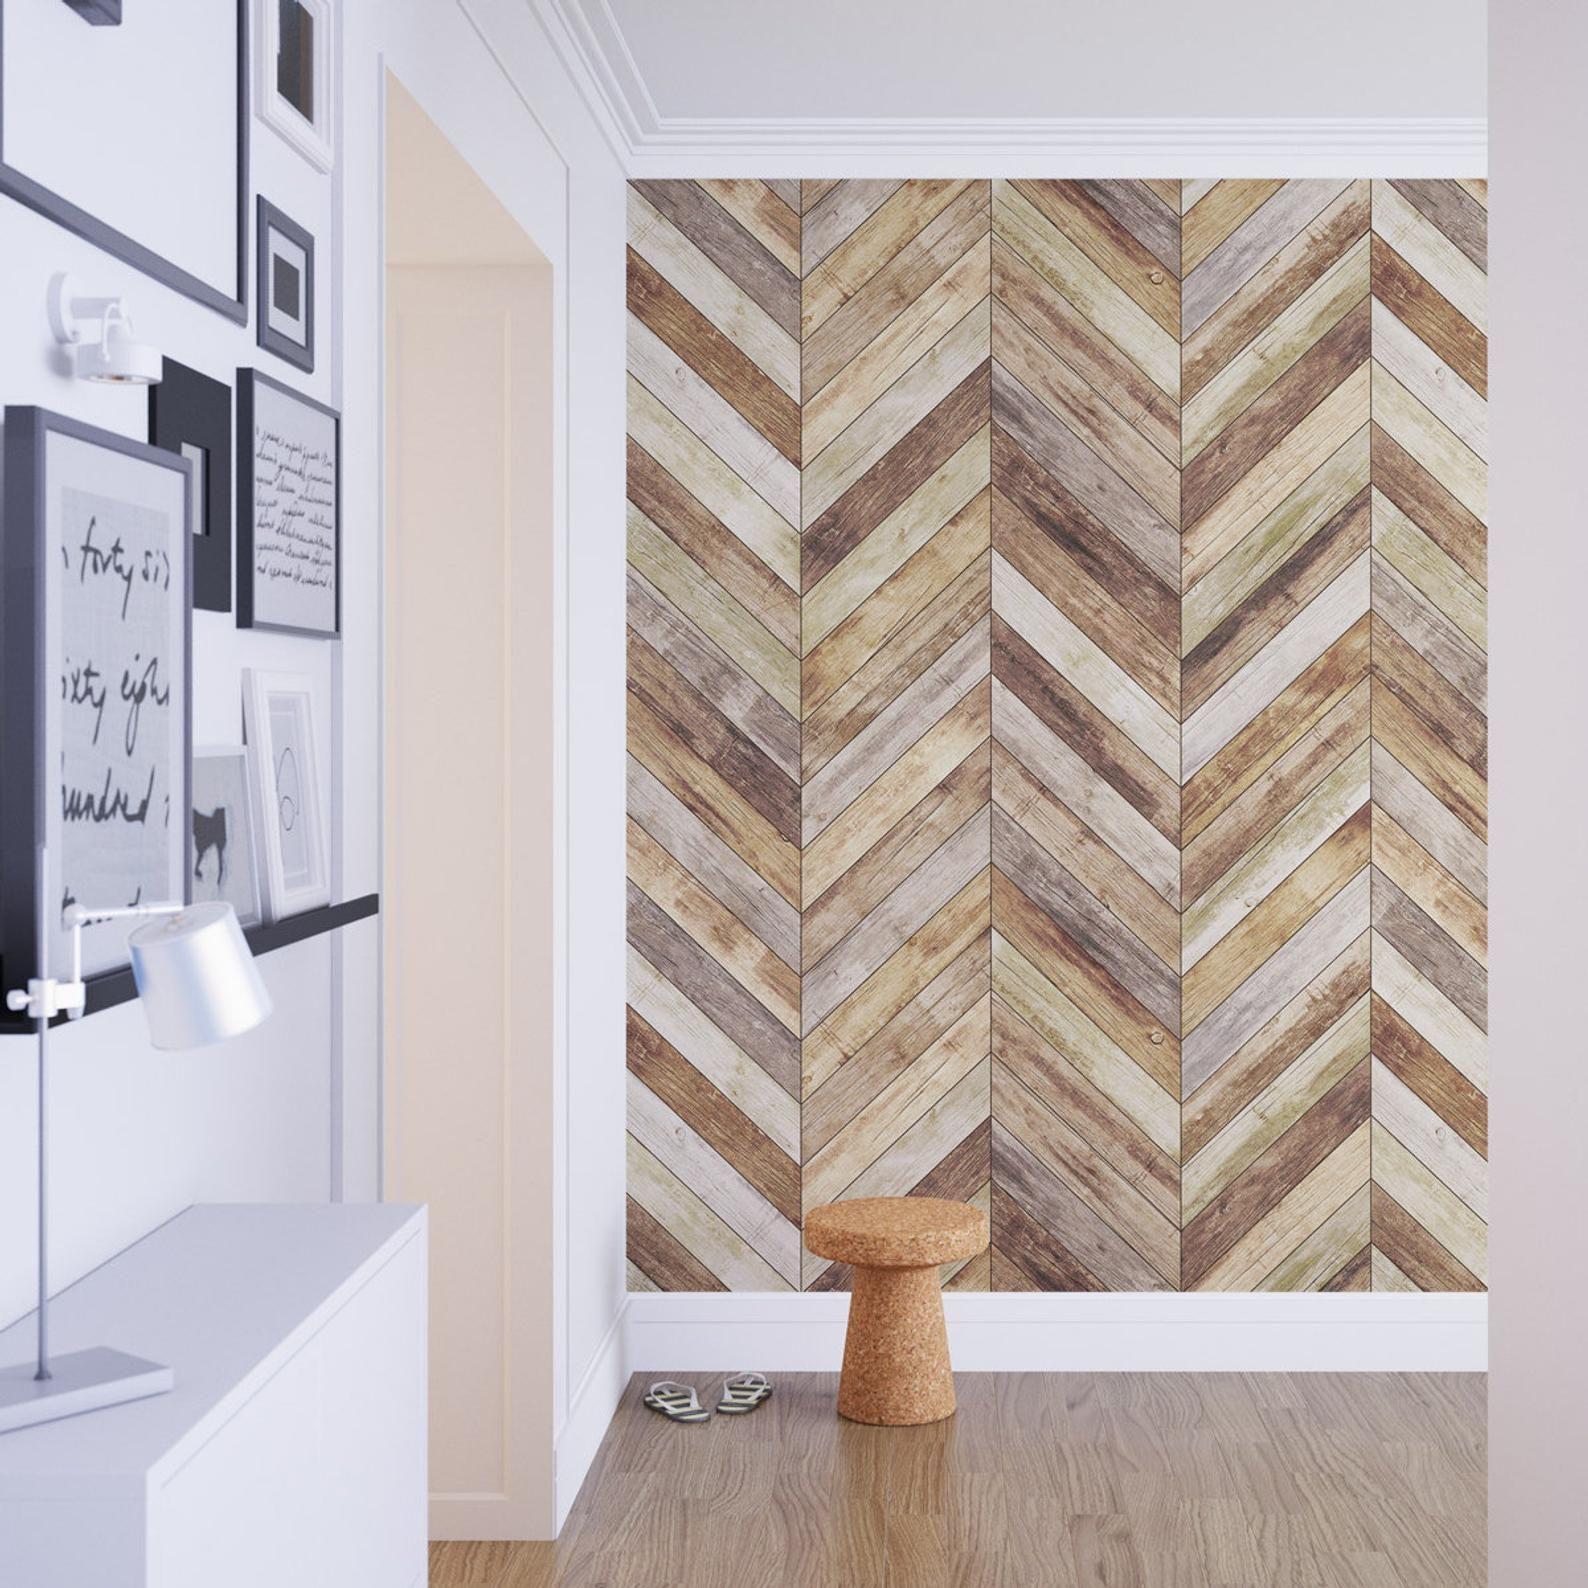 Chevron Harringbone Wood Removable Wallpaper Wood Etsy In 2021 Wood Wallpaper Stick On Wood Wall Removable Wallpaper